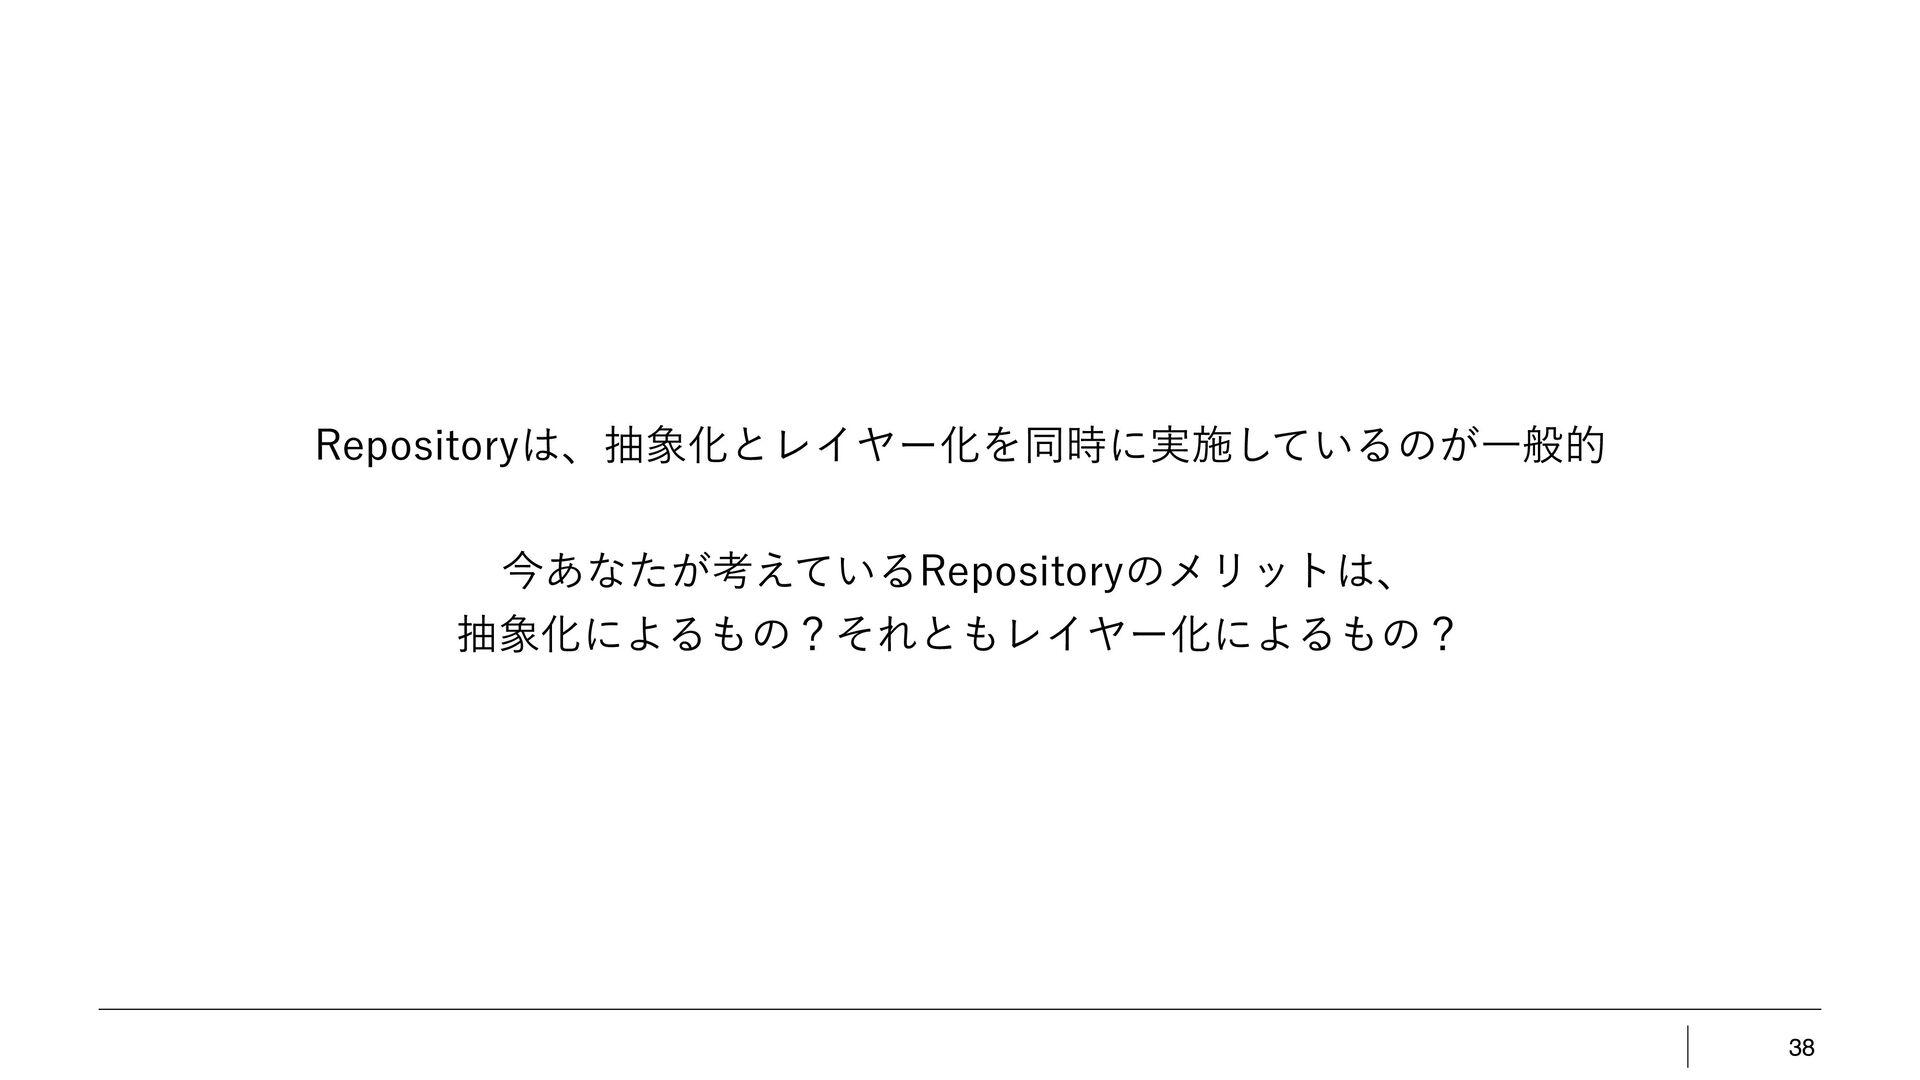 38 ϨΠϠʔԽͷϝϦοτ ؔ৺͝ͱͷ ୯Ұͷݪଇ ࣮ͷӅṭ